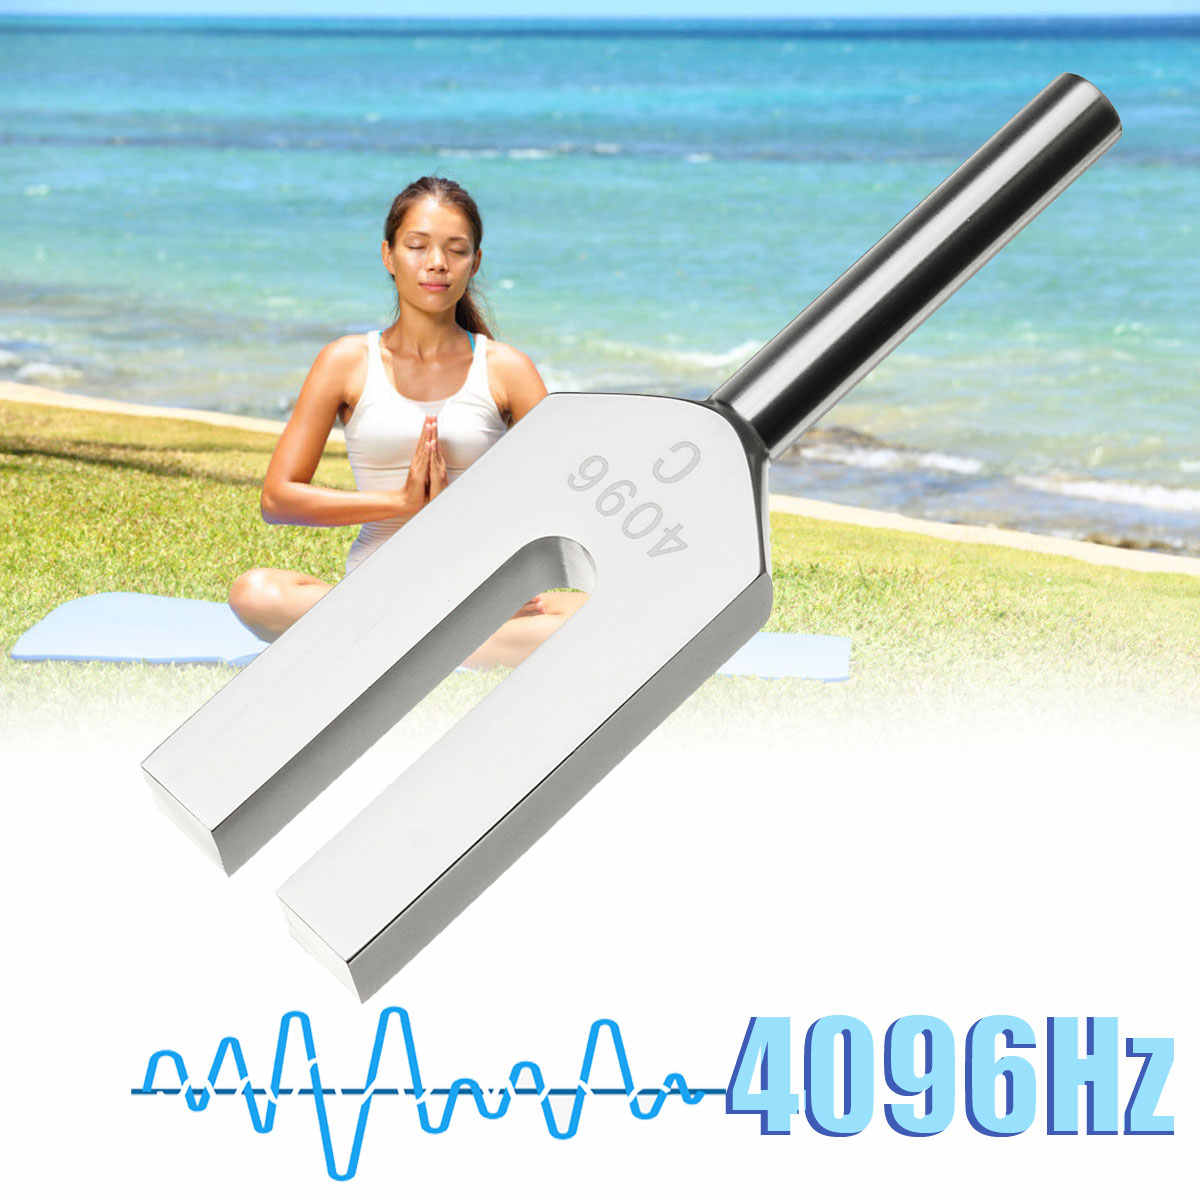 ZEAST 4096 50-60hz アルミミュージカル音叉楽器治癒サウンド振動治療医療ツール